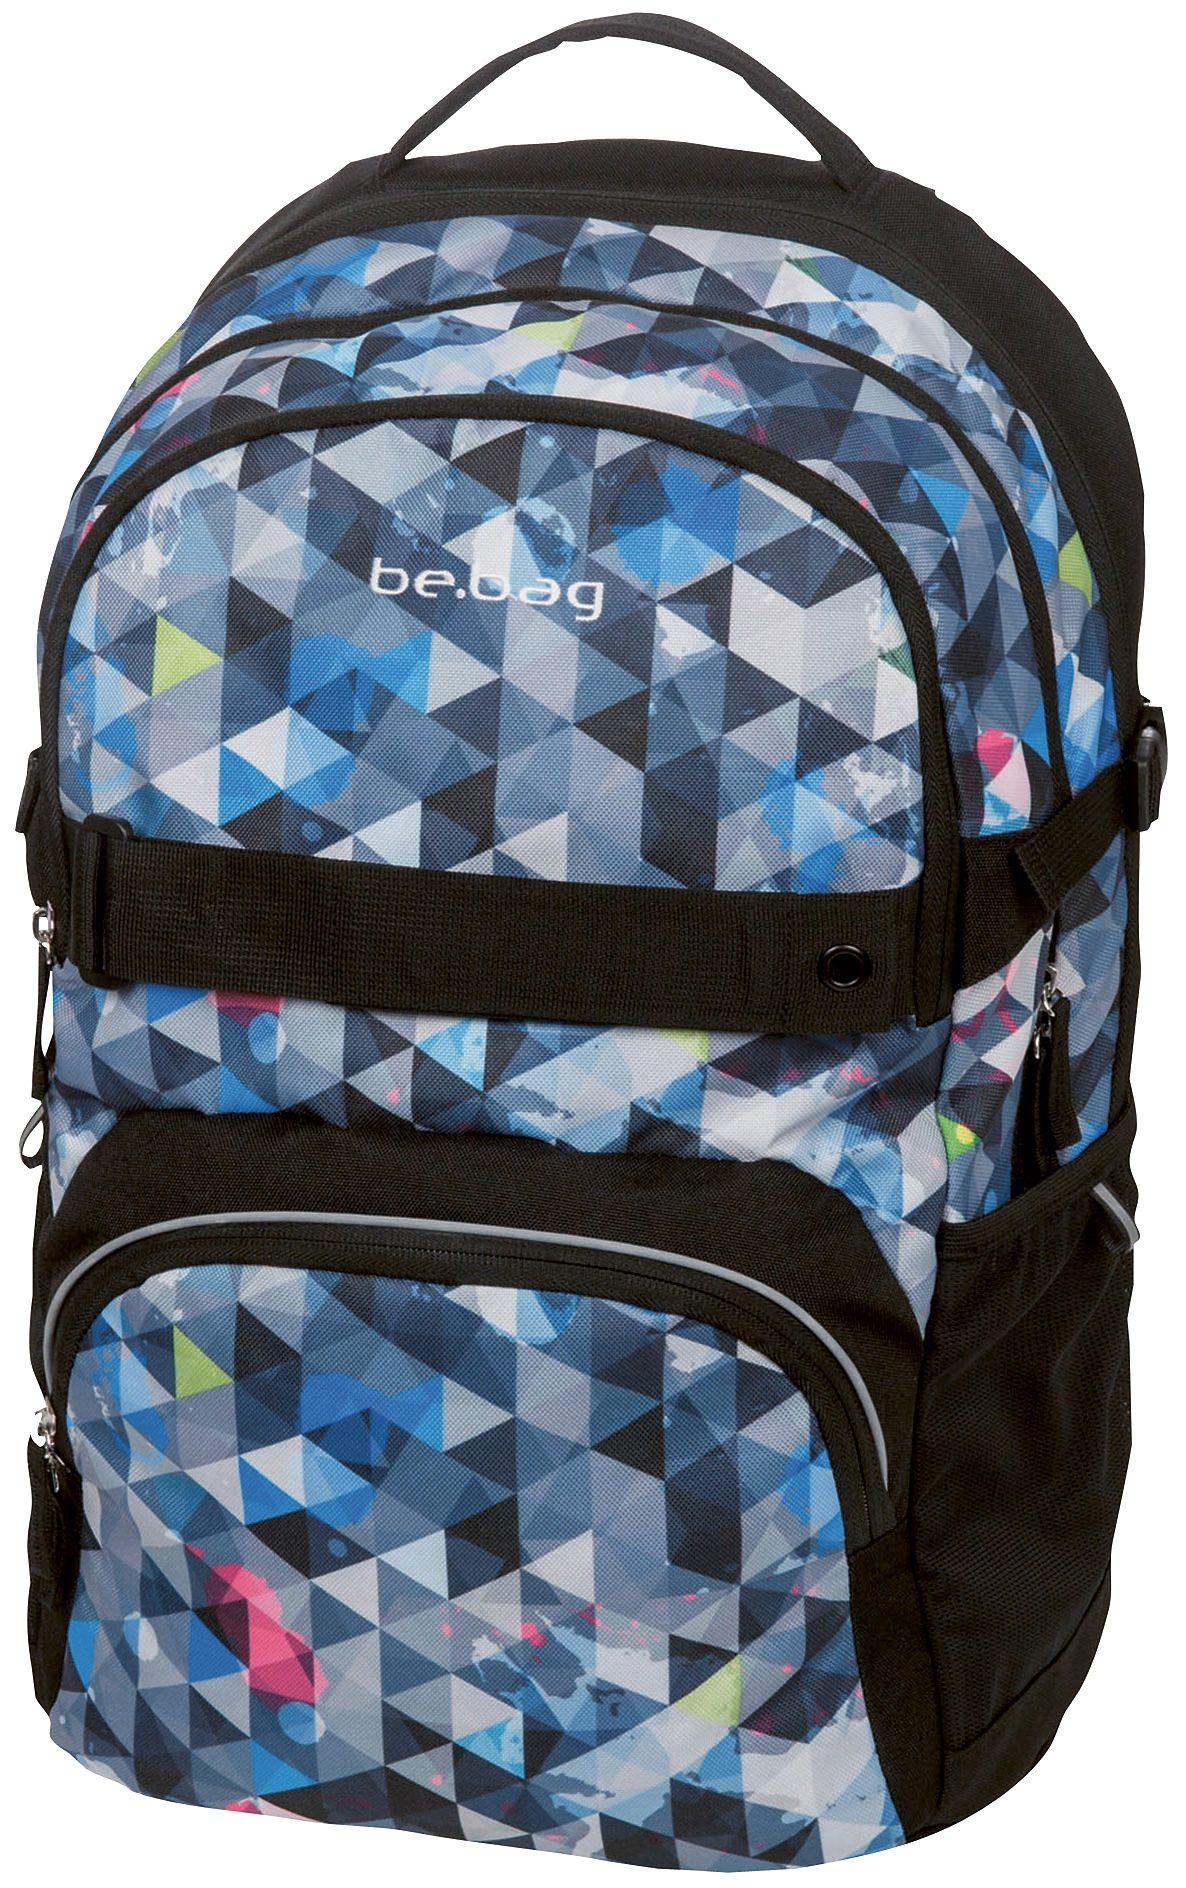 Herlitz Schulrucksack, »be.bag cube, Snowboard«